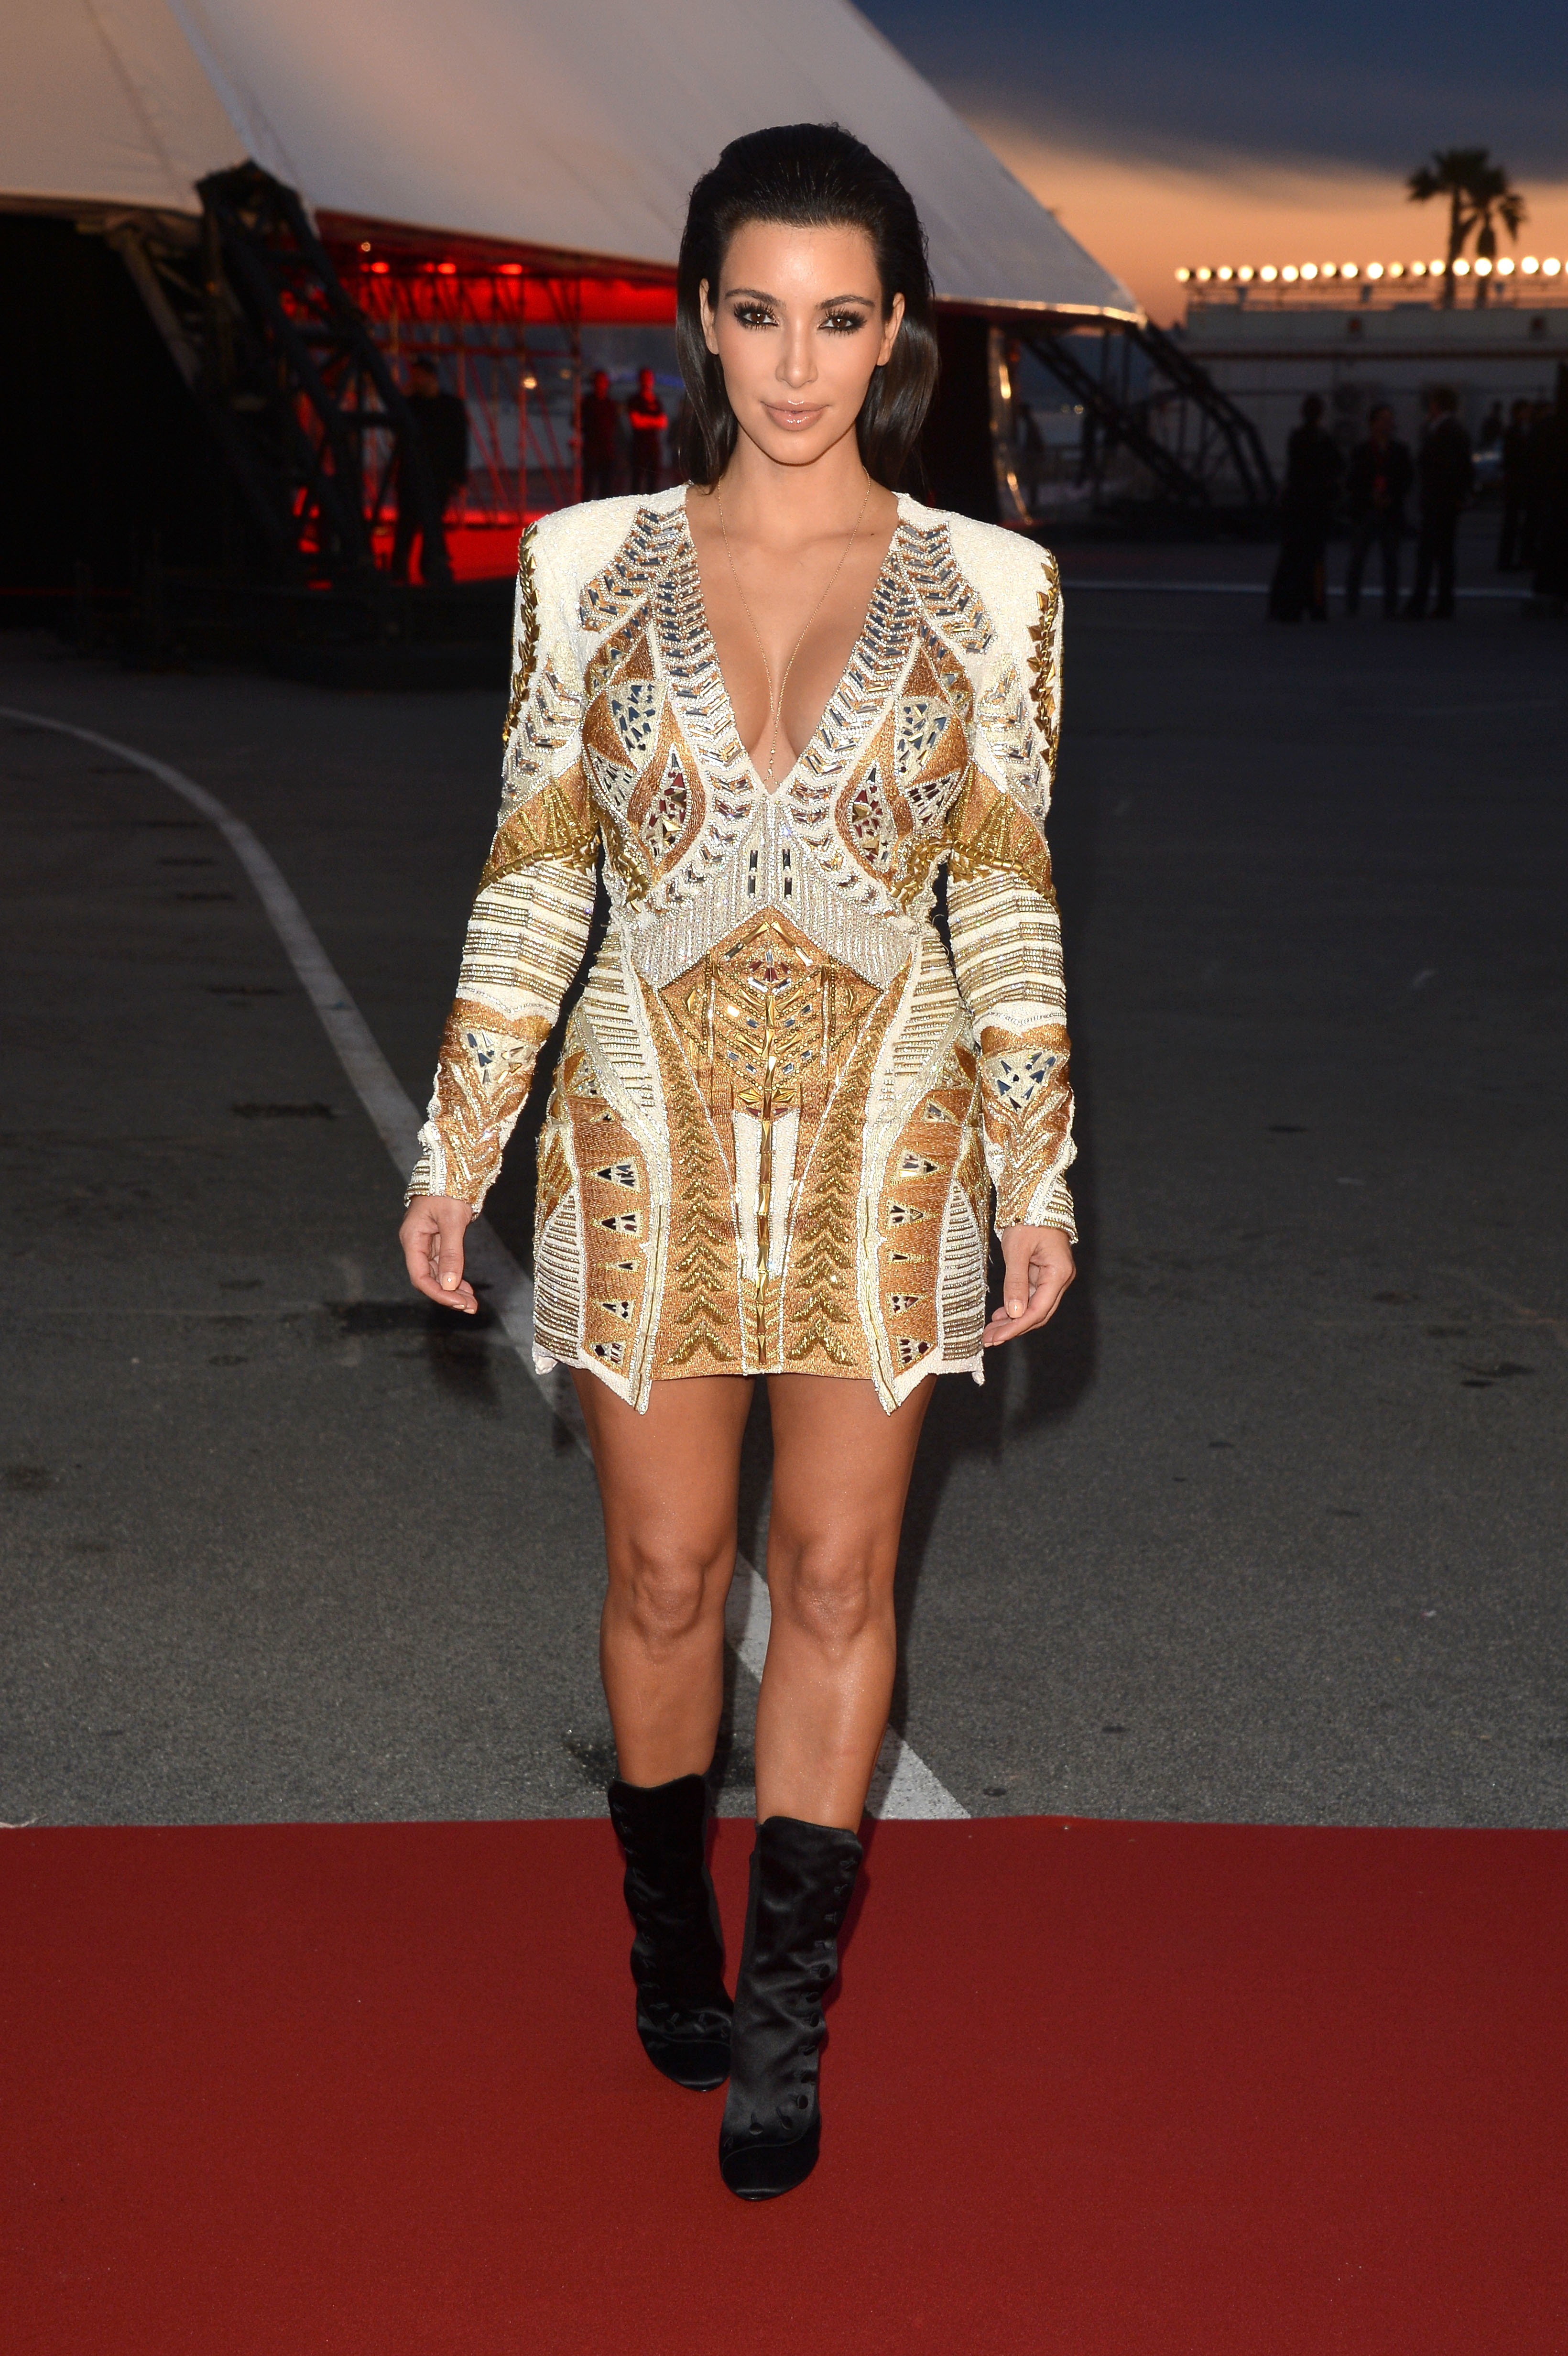 KIm kardashian alessandra ambrosio who wore it better